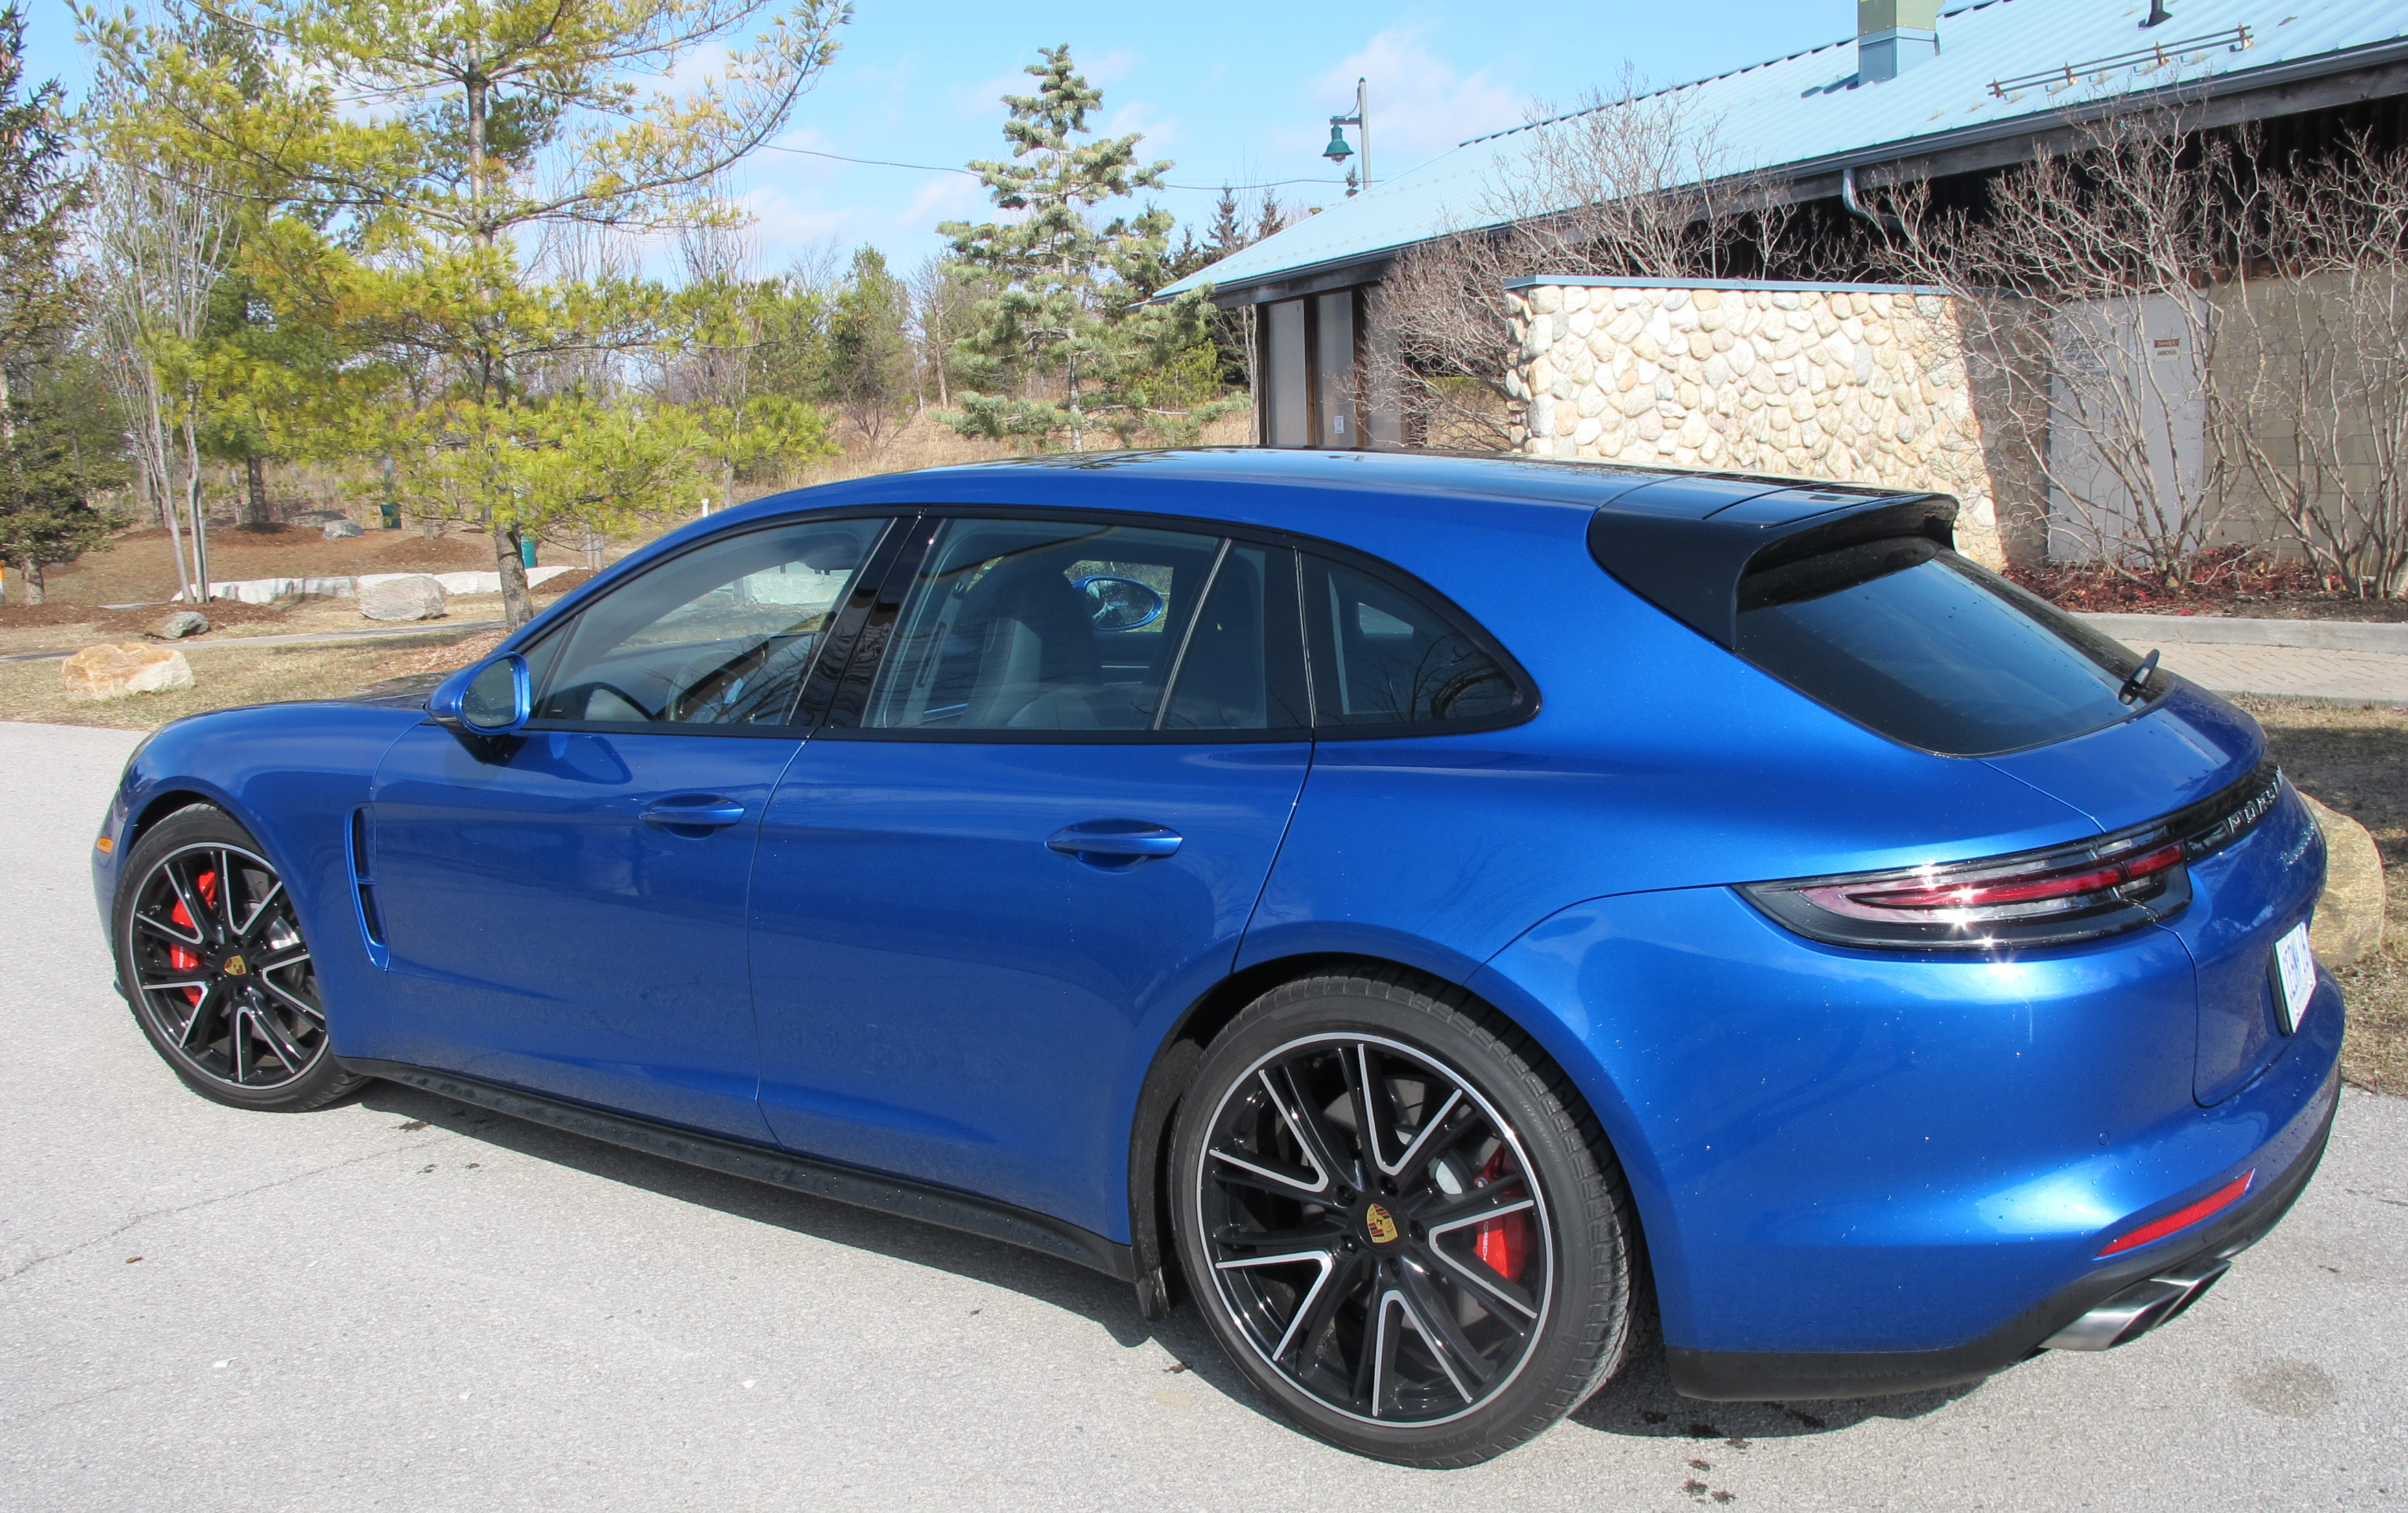 2018 Porsche Panamera Turbo Sport Turismo review